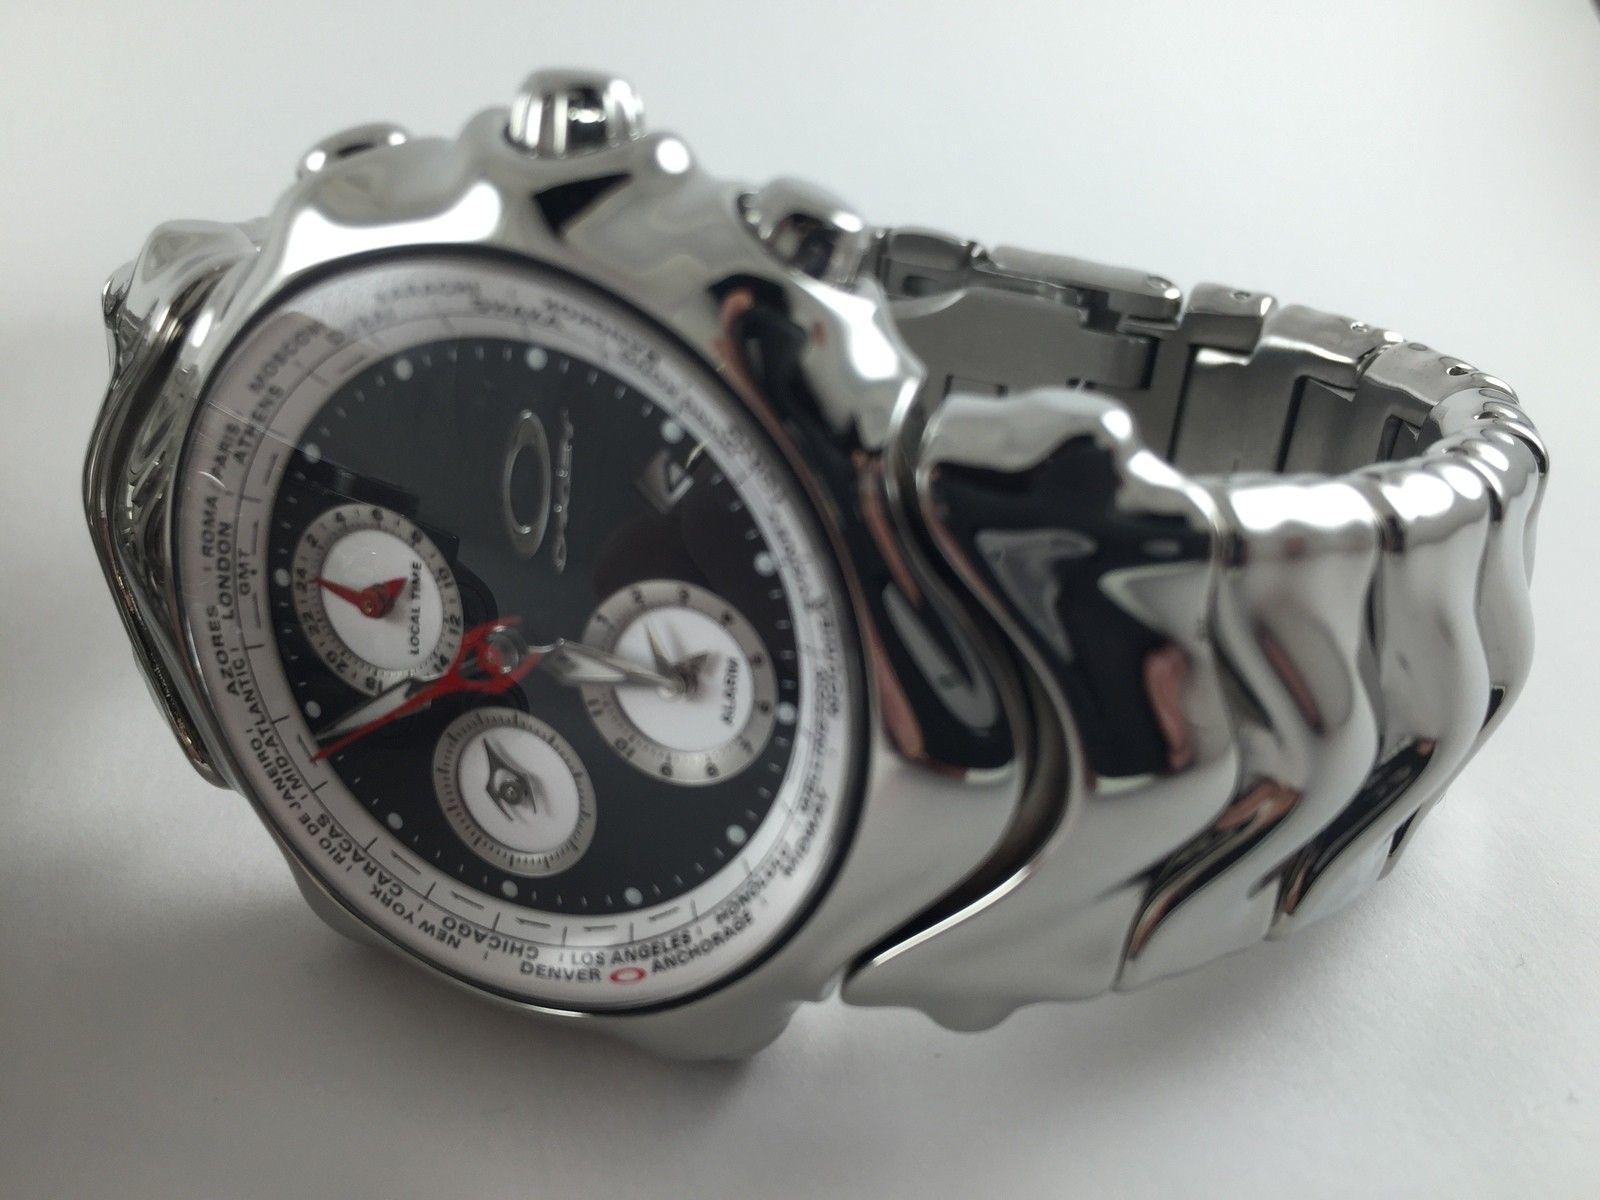 Hollow Point & GMT Watch - 15092902994_aaeb612e96_o.jpg